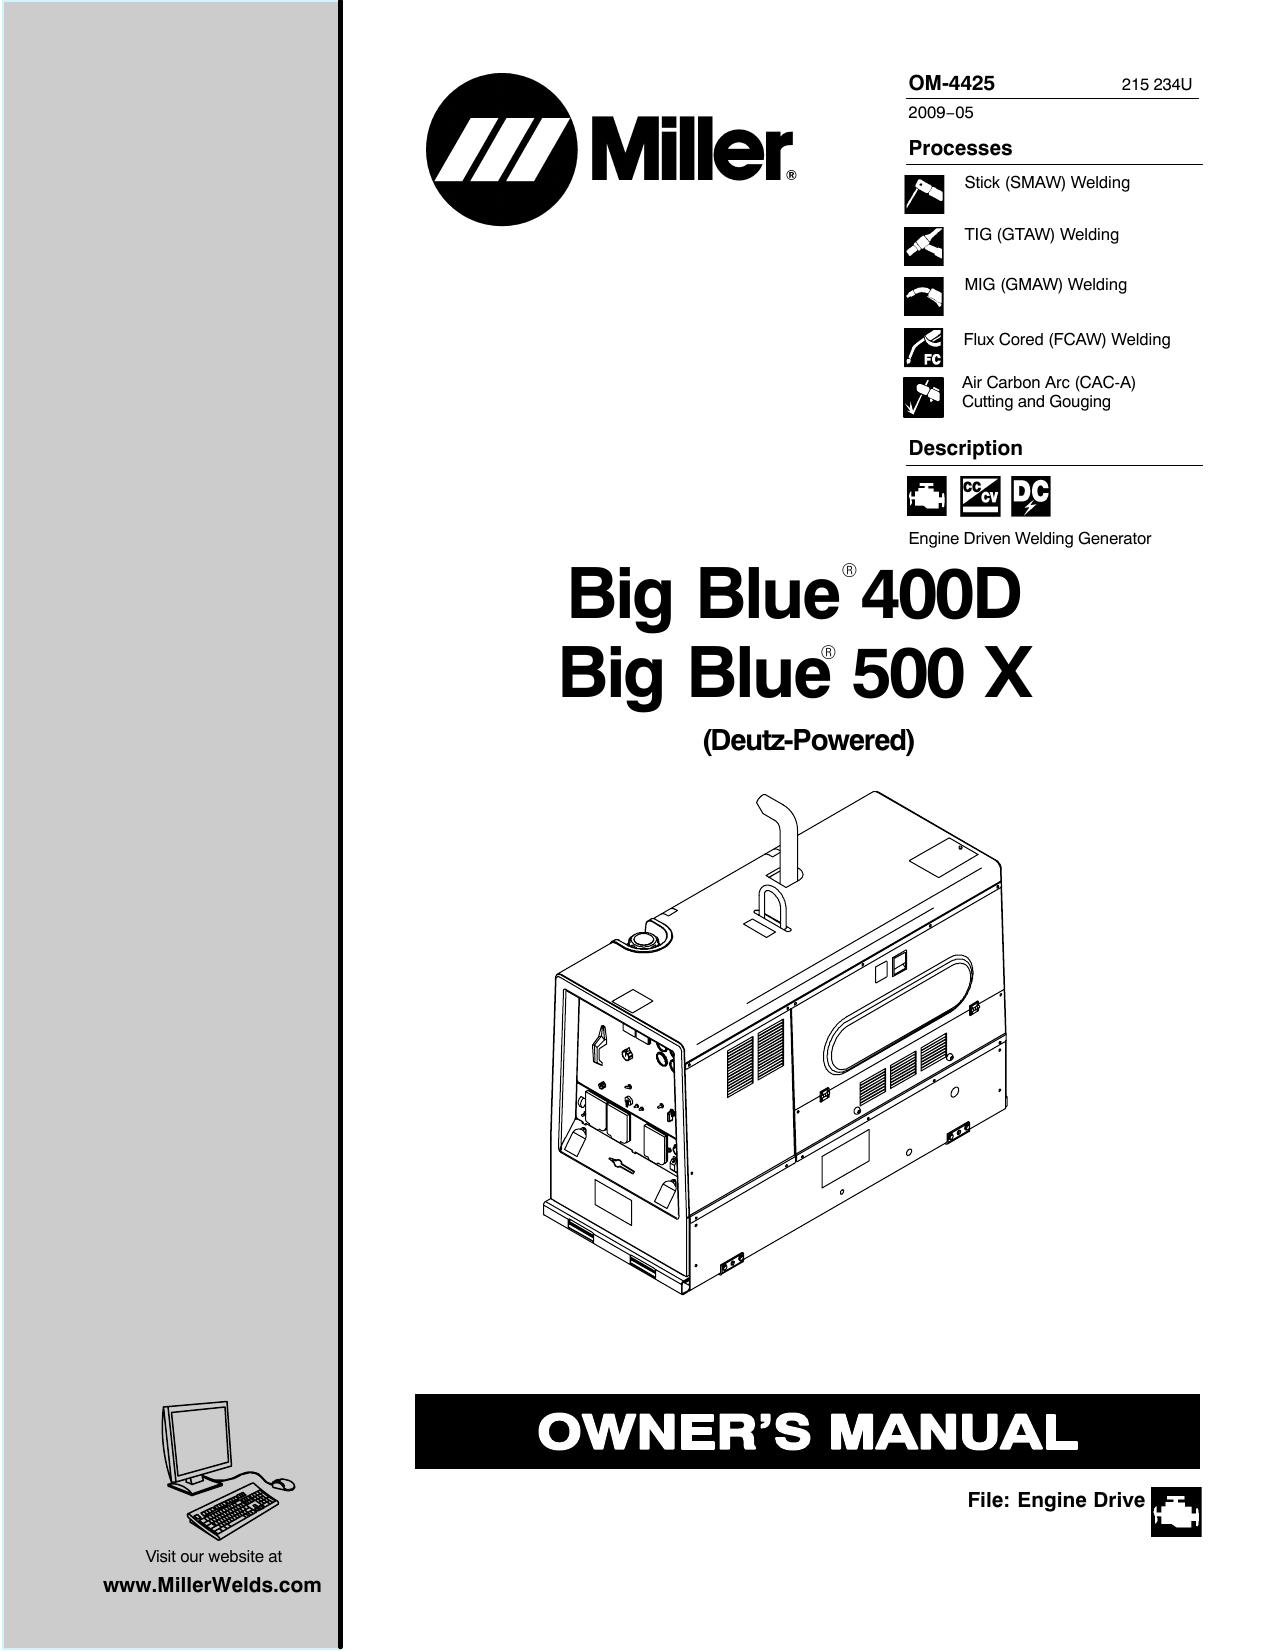 Big Blue 400D Big Blue 500 X   Manualzzmanualzz